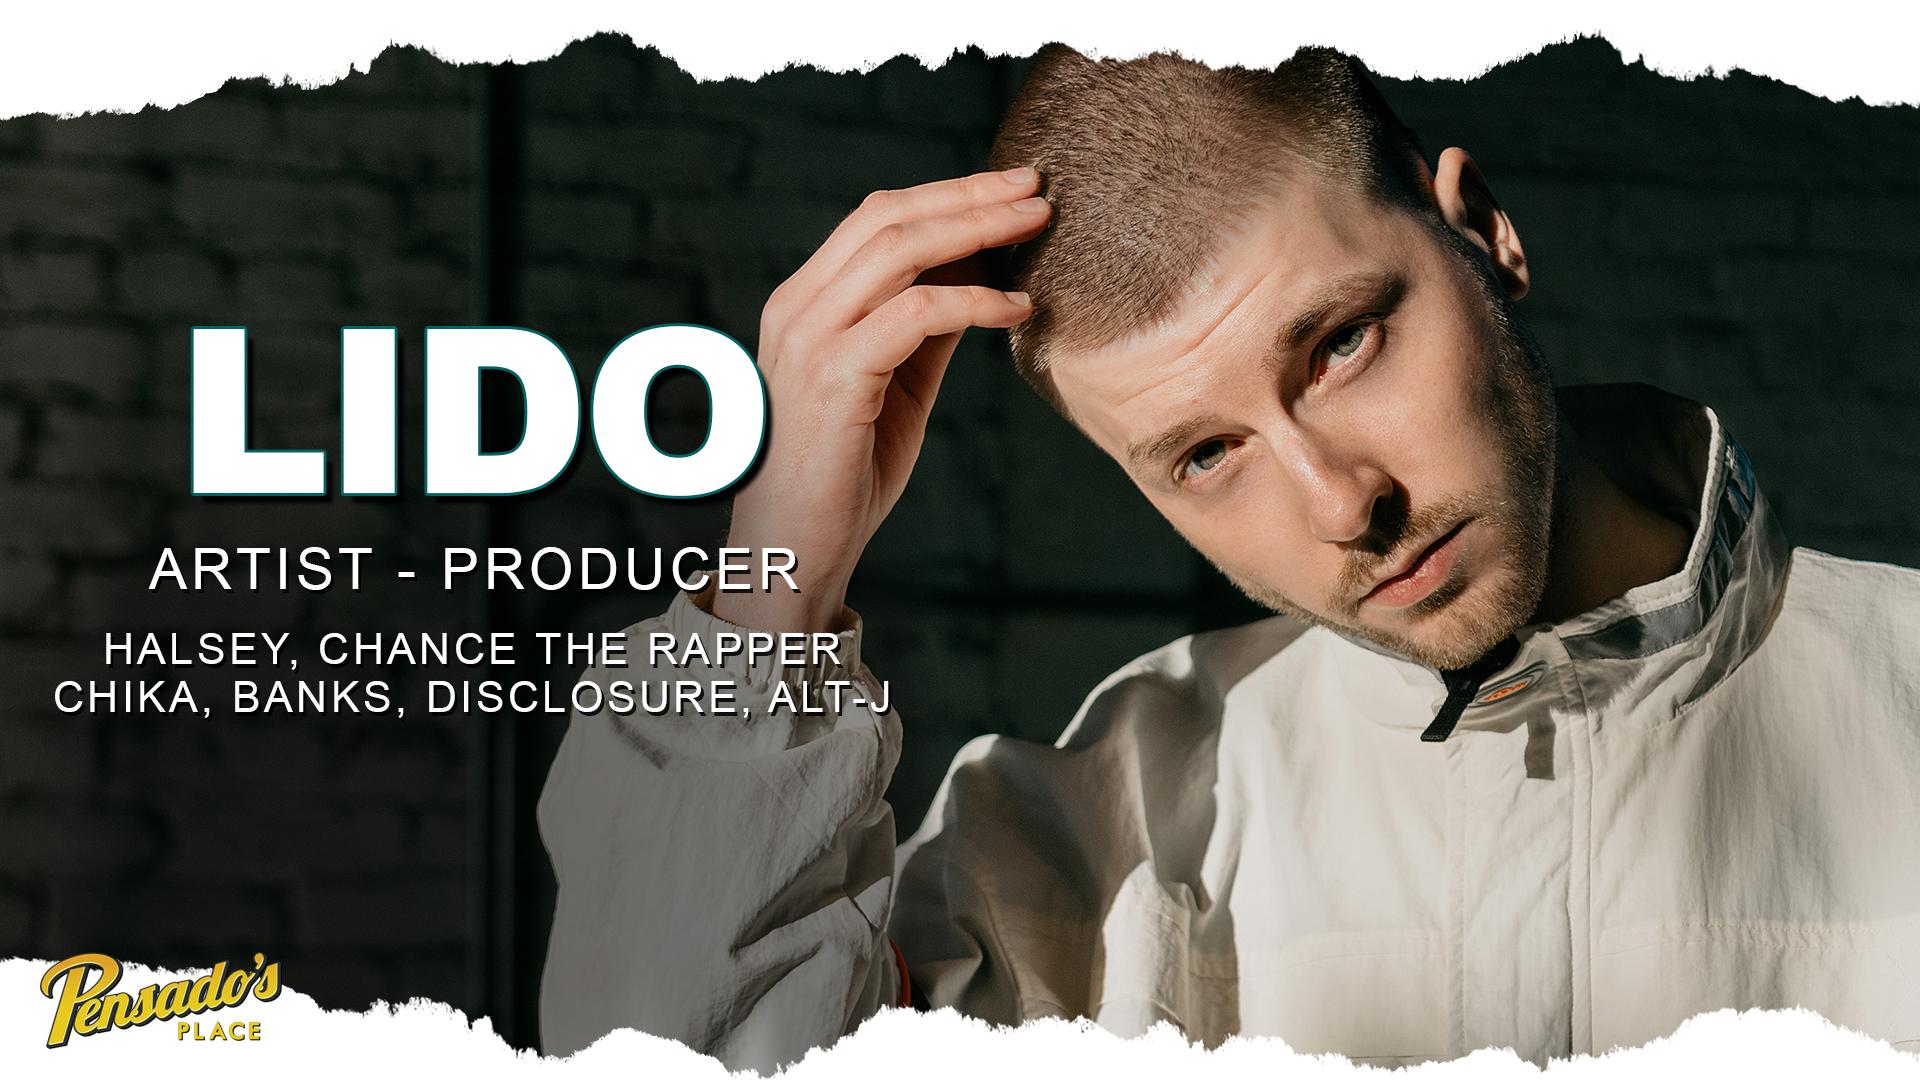 Artist / Producer, Lido